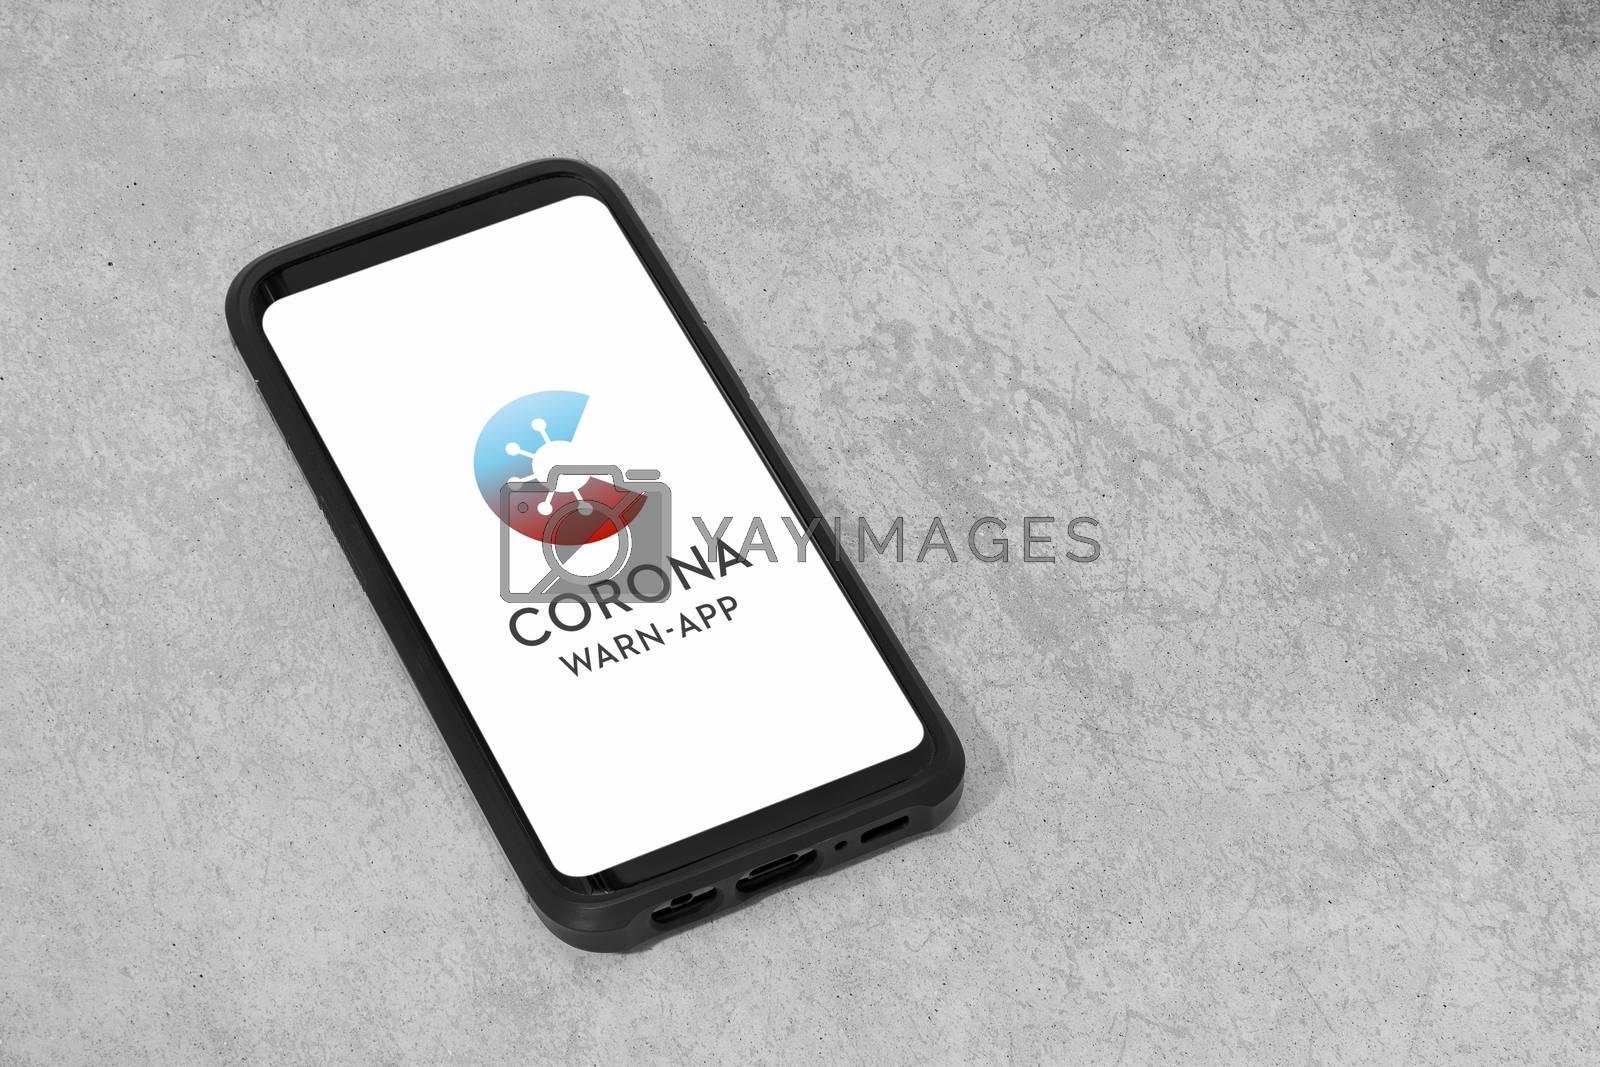 Galicia, Spain; june 18, 2020: German Corona Warn App in mobile phone on grunge concrete background. Copy space